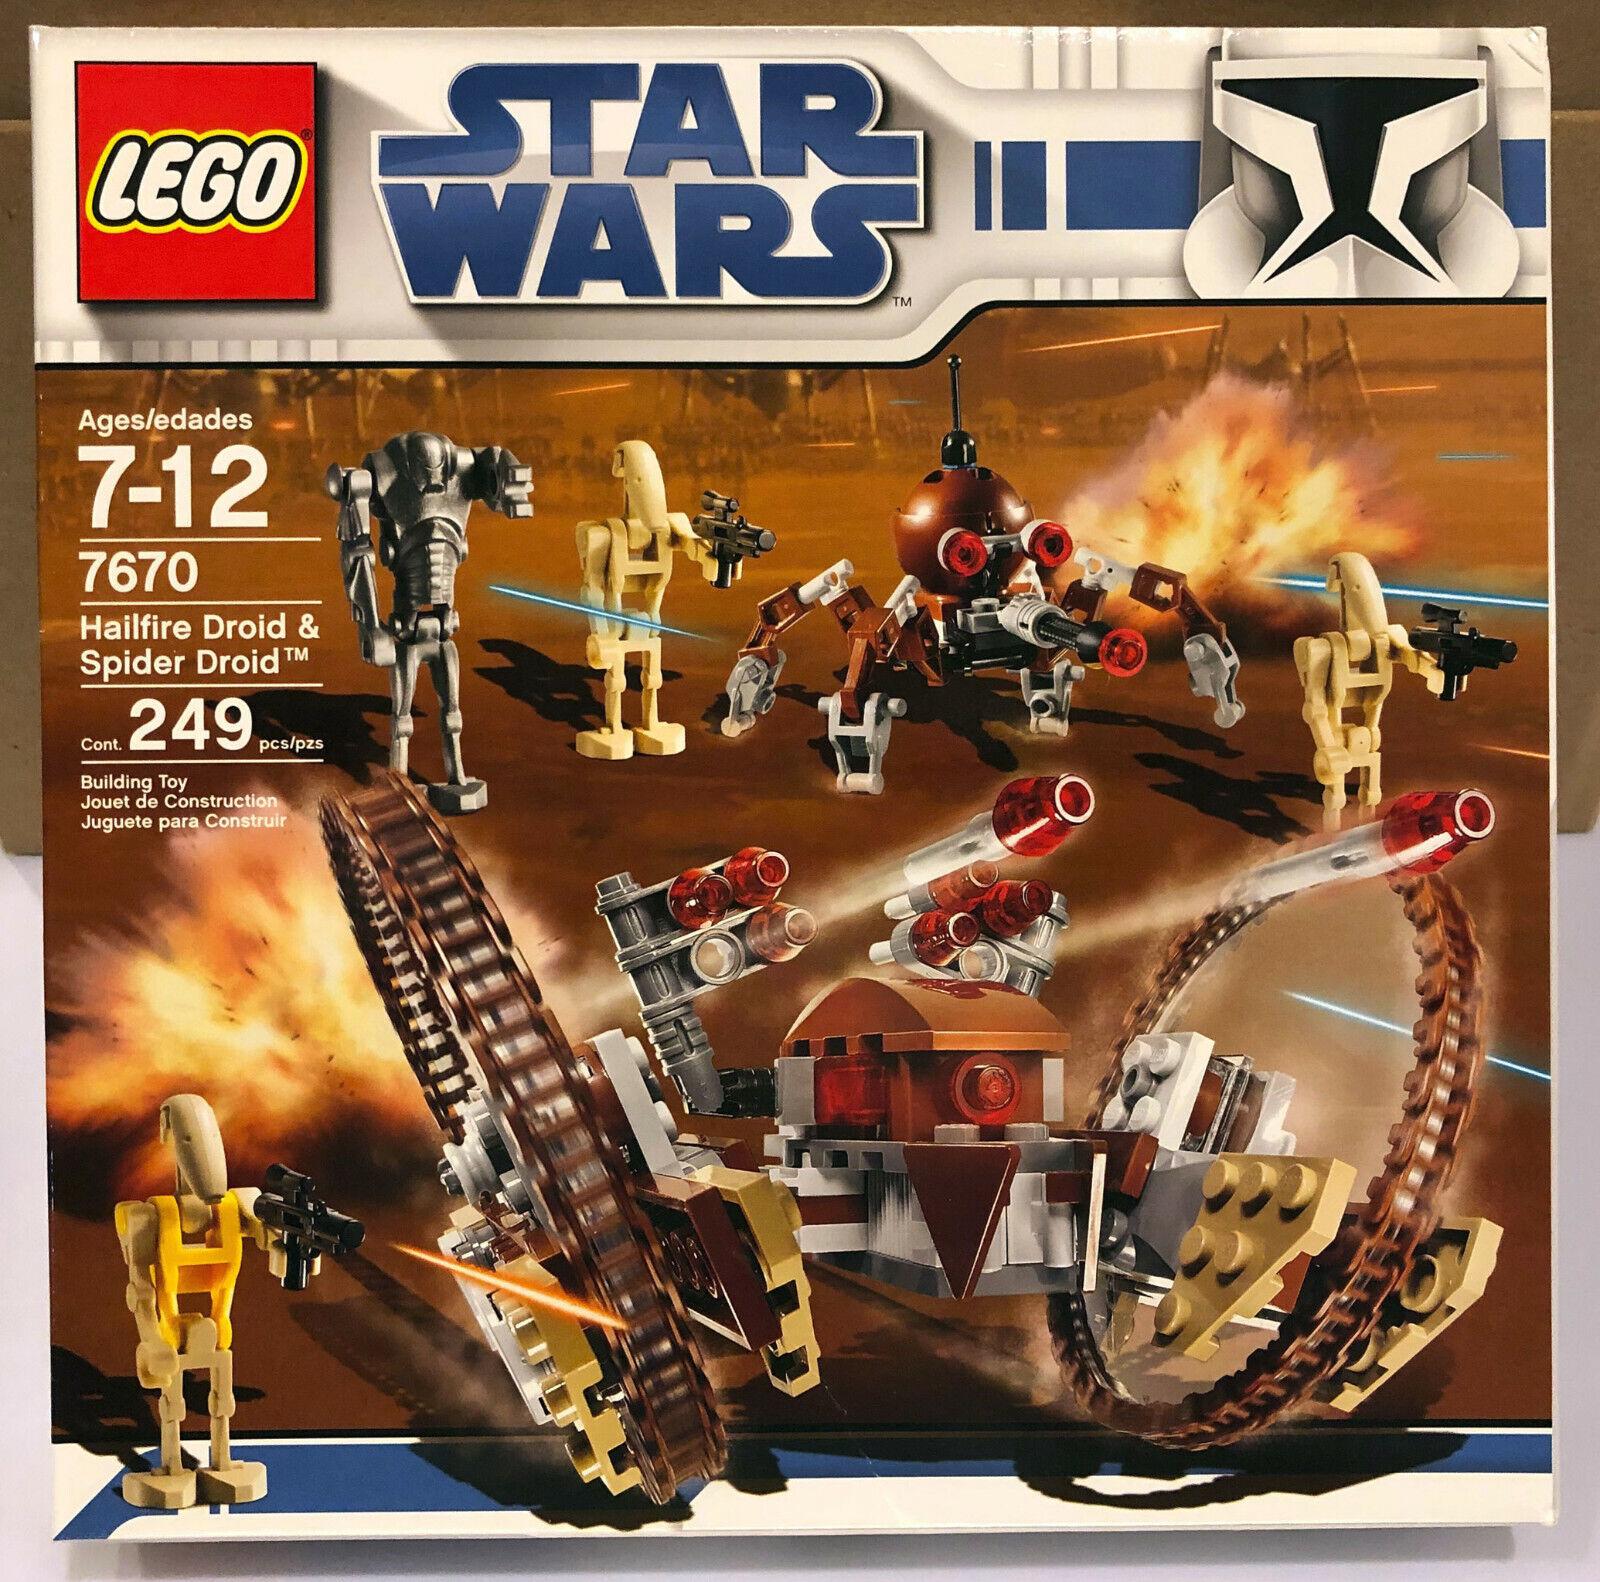 LEGO STAR WARS 7670 Hailfire Droid & Spider Droid  Nouveau DGSIM SEALED CLONE WARS